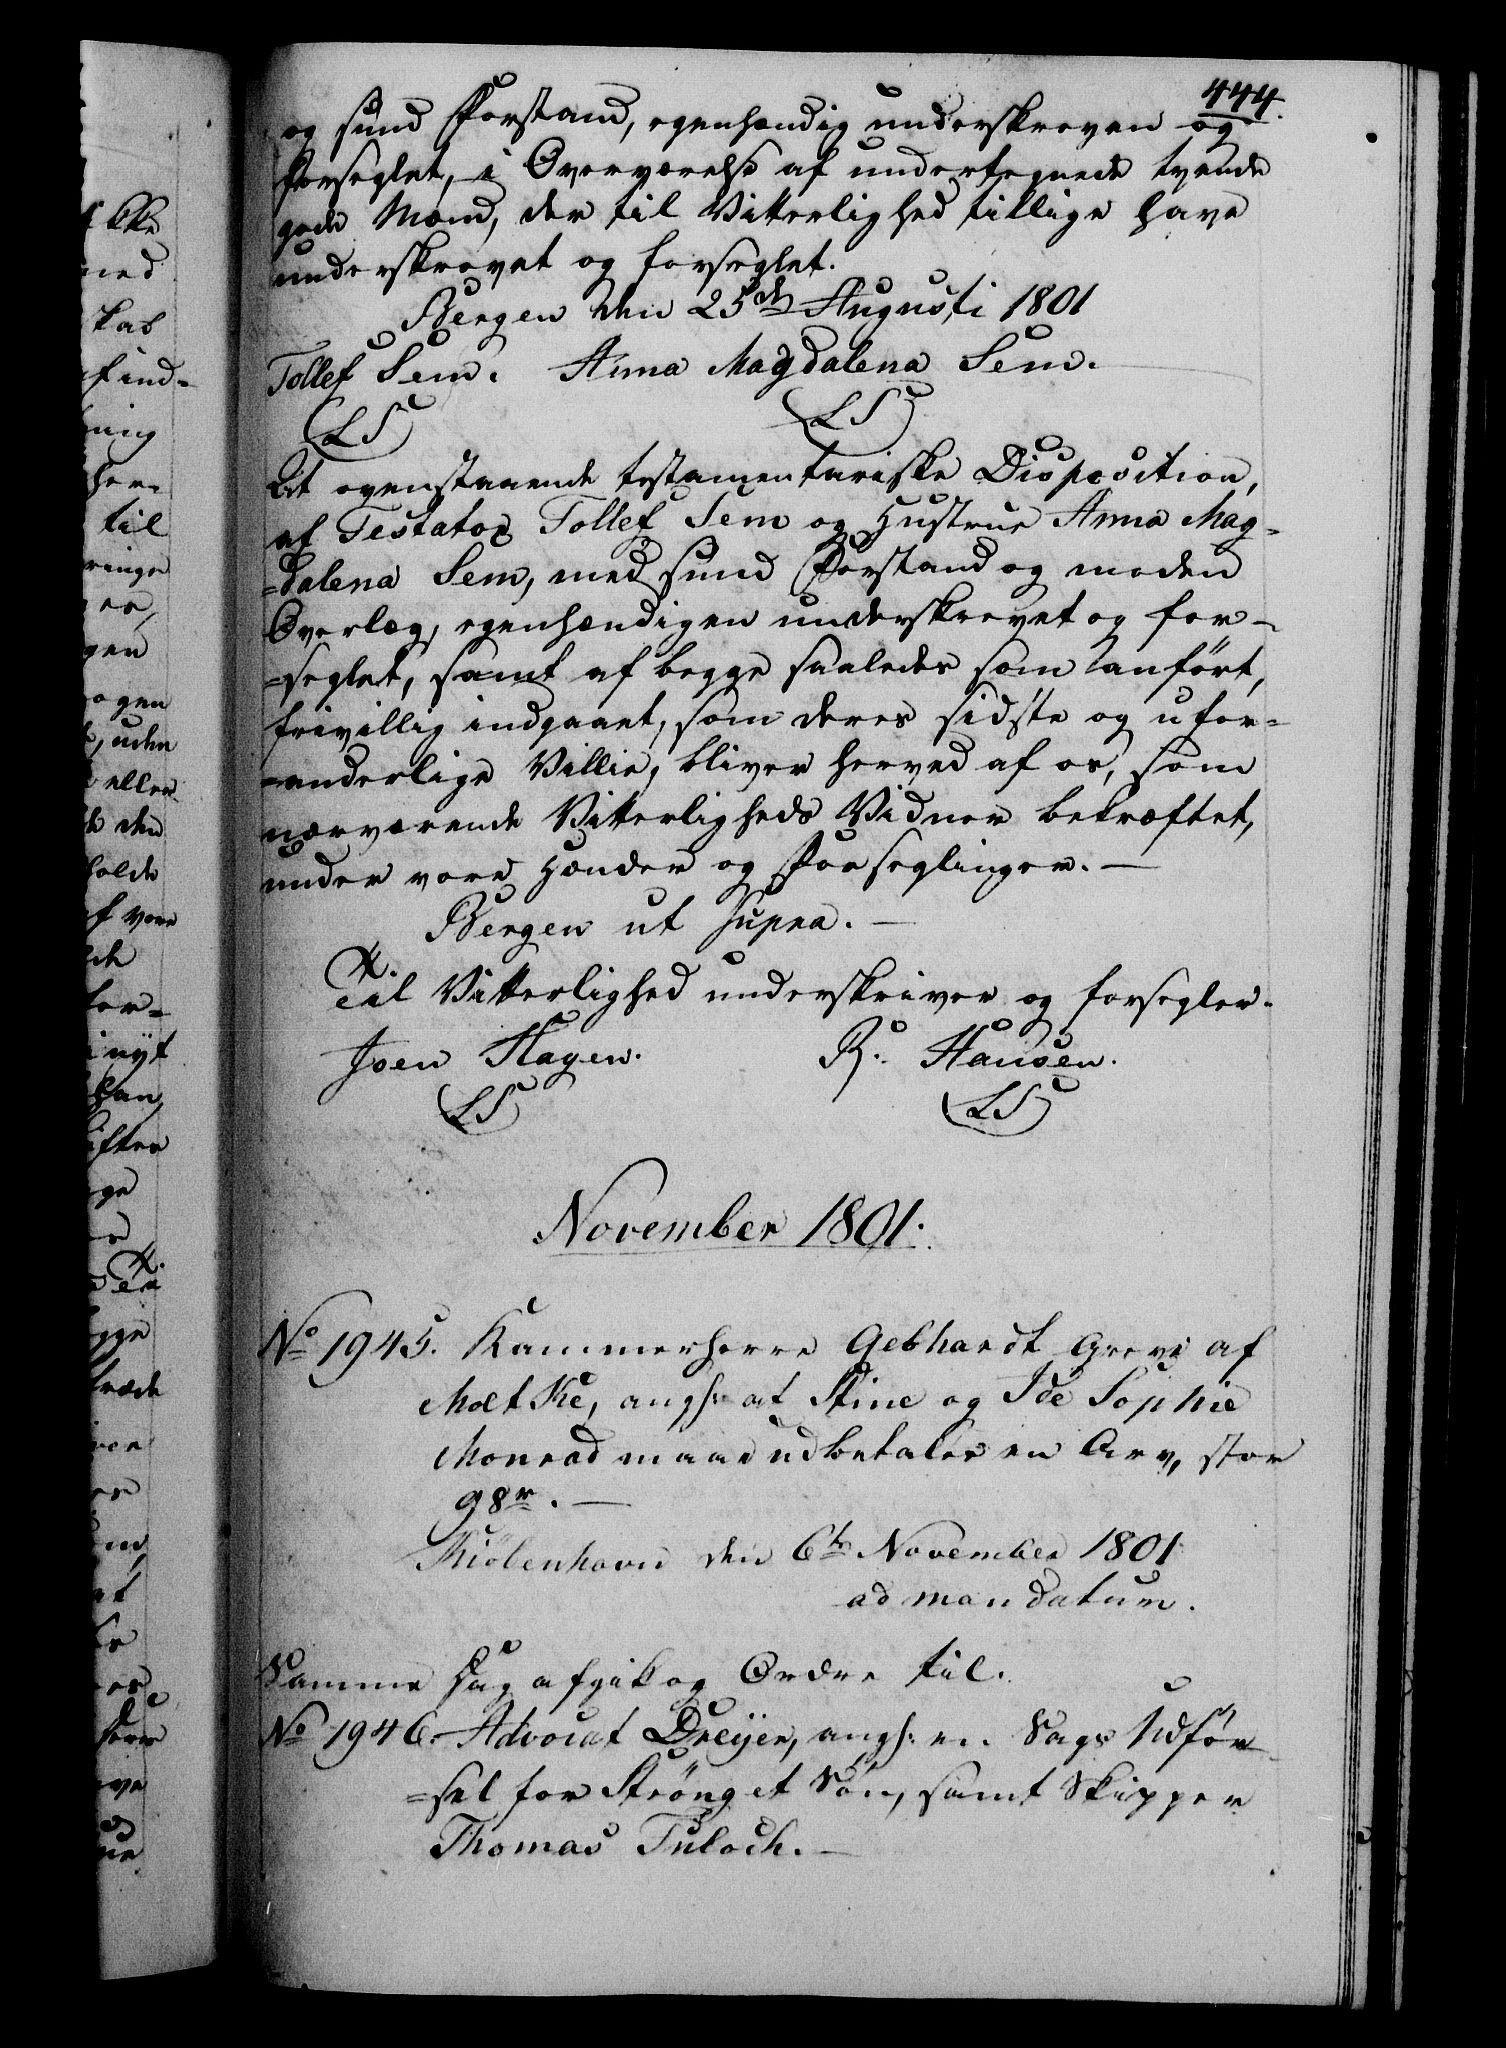 RA, Danske Kanselli 1800-1814, H/Hf/Hfb/Hfba/L0001: Registranter, 1800-1801, s. 444a